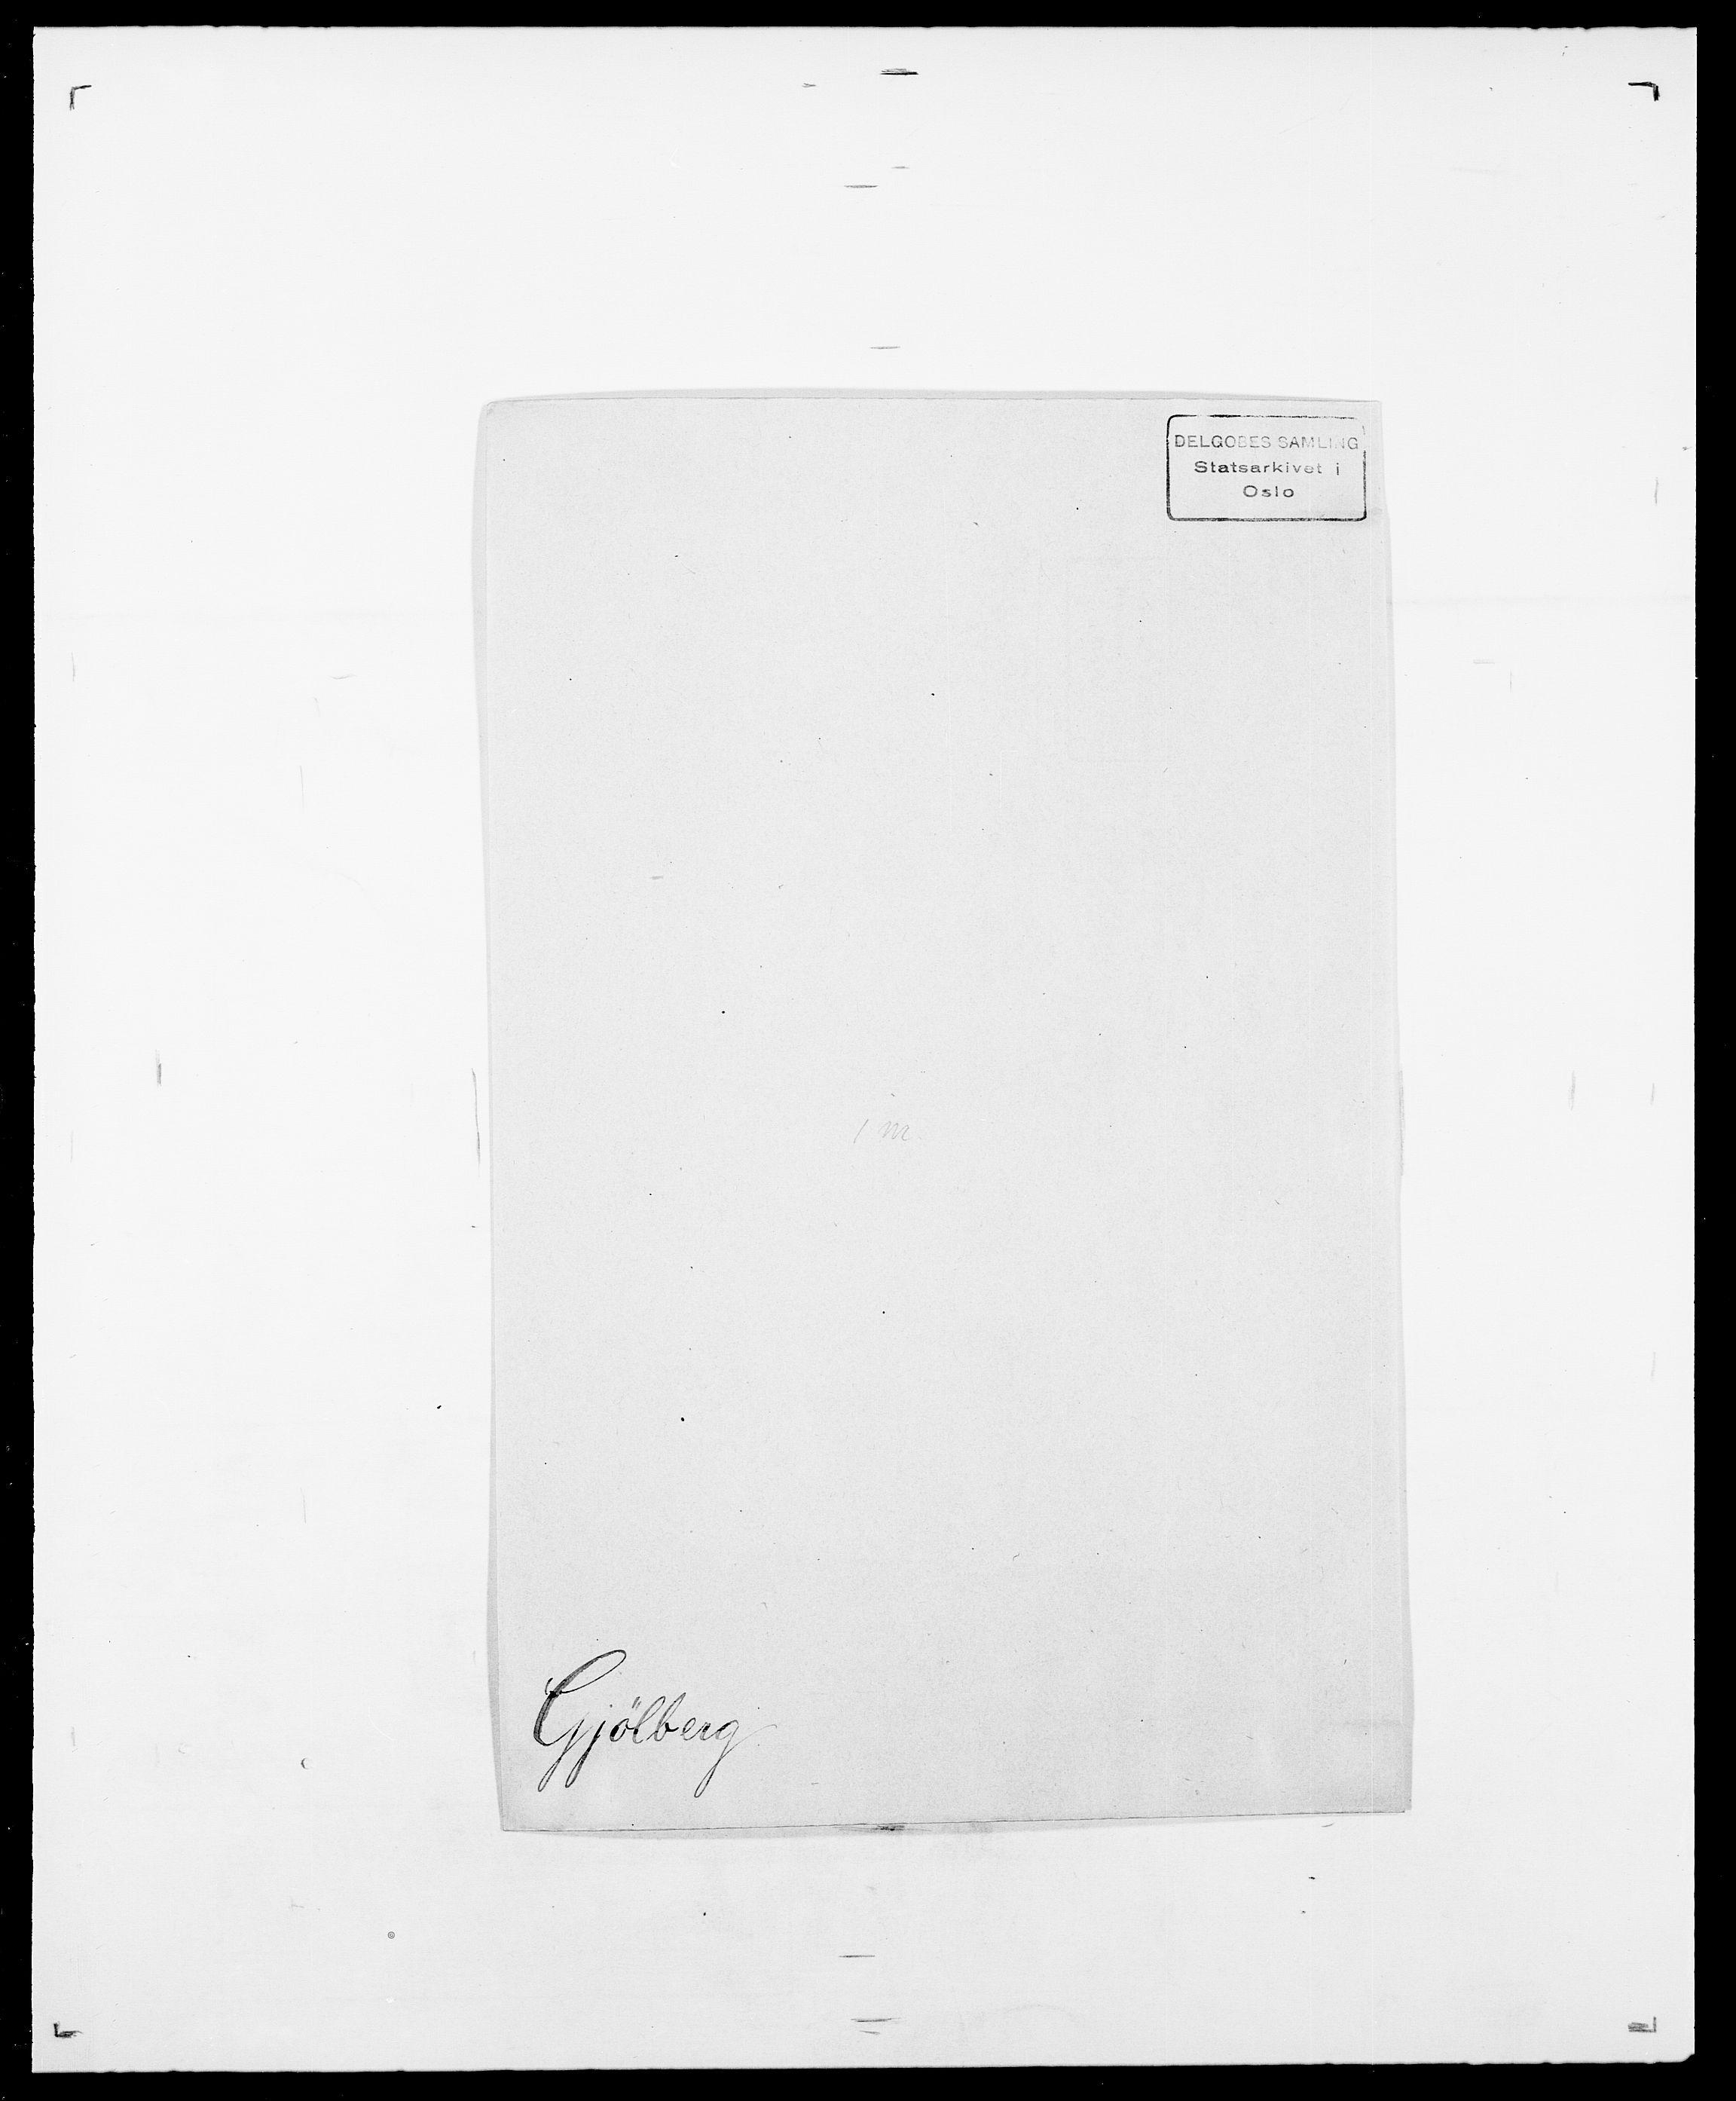 SAO, Delgobe, Charles Antoine - samling, D/Da/L0014: Giebdhausen - Grip, s. 213